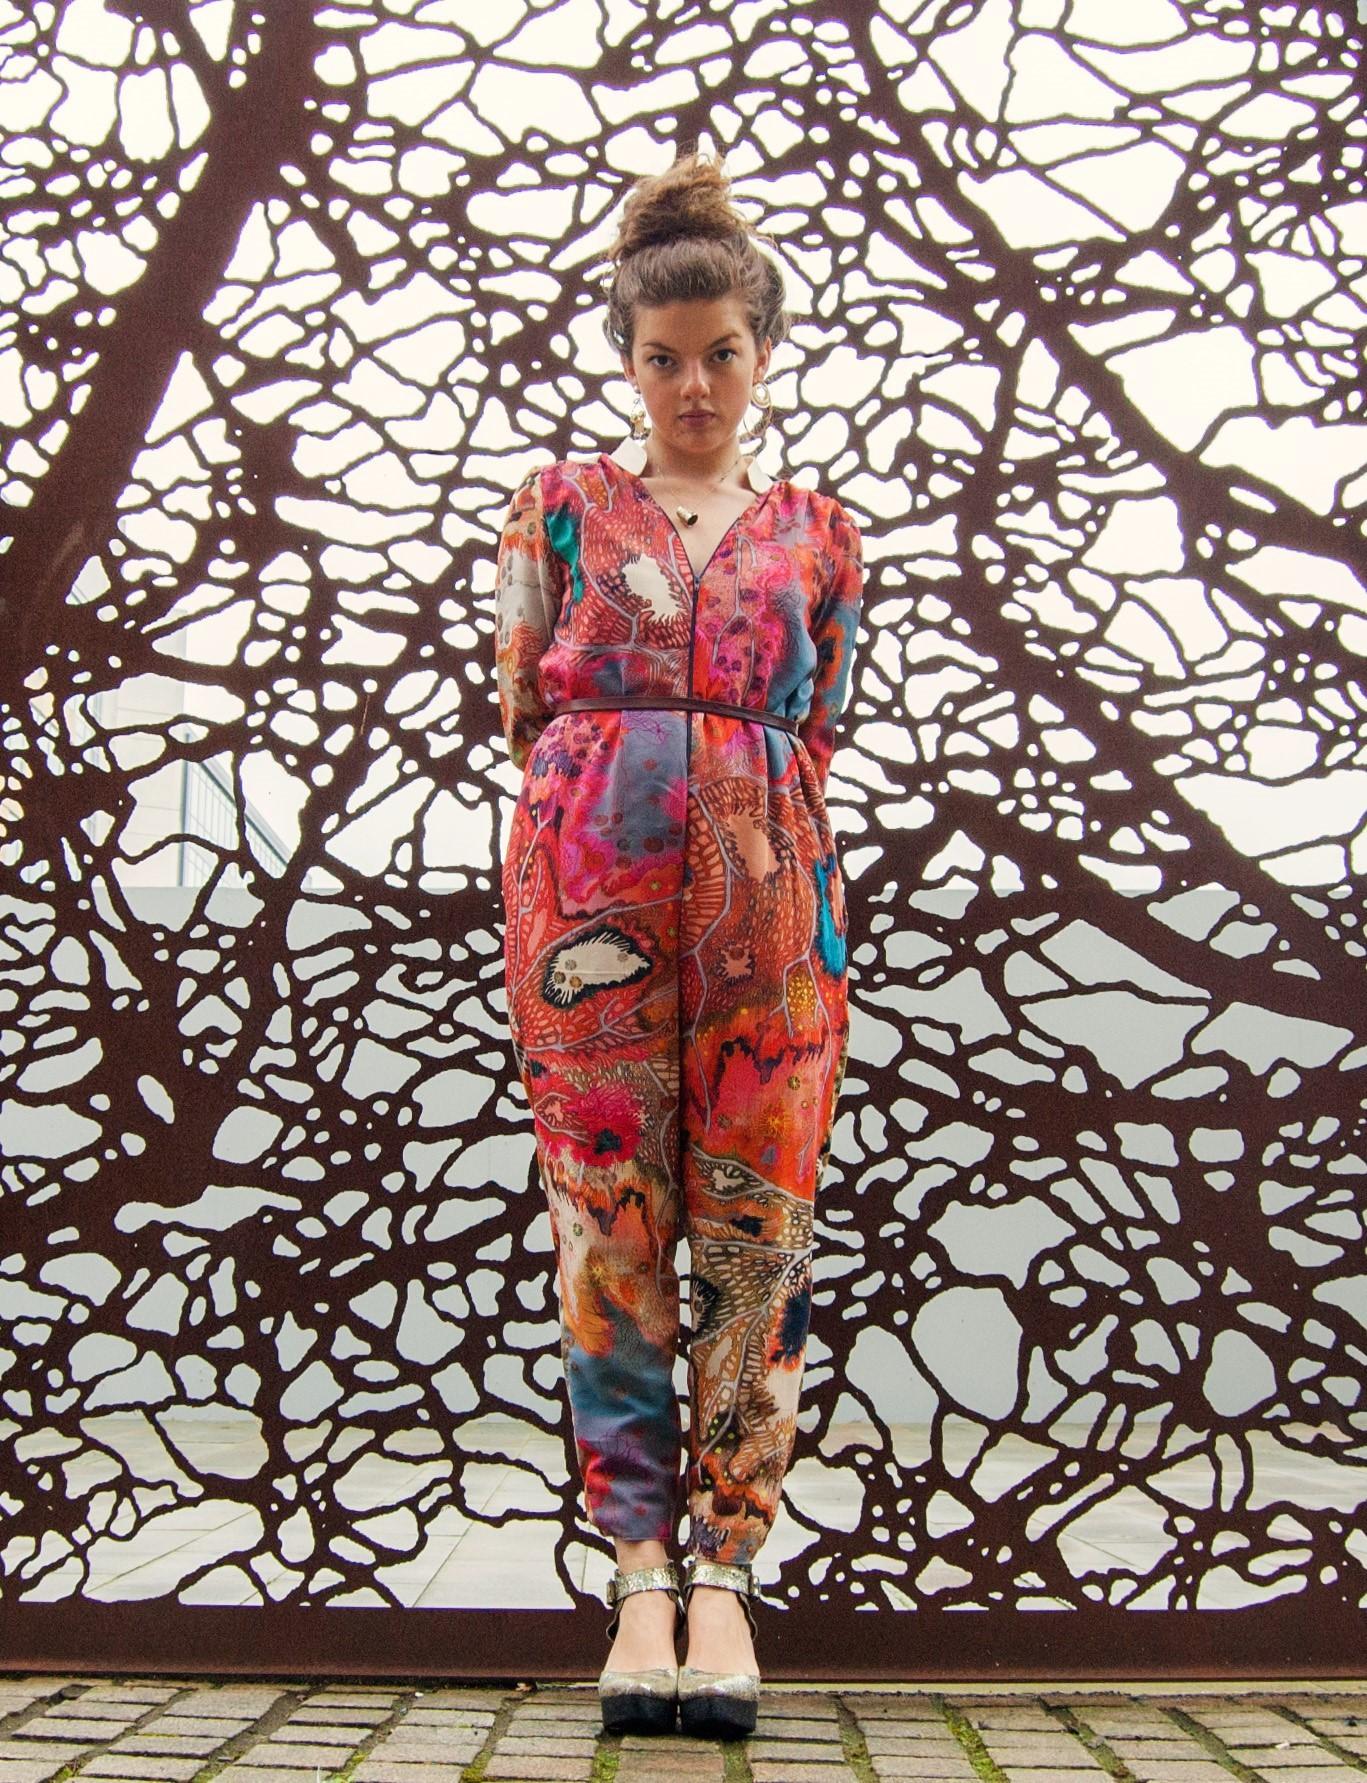 Lydia MYW5-112 - 29Jun16.jpg